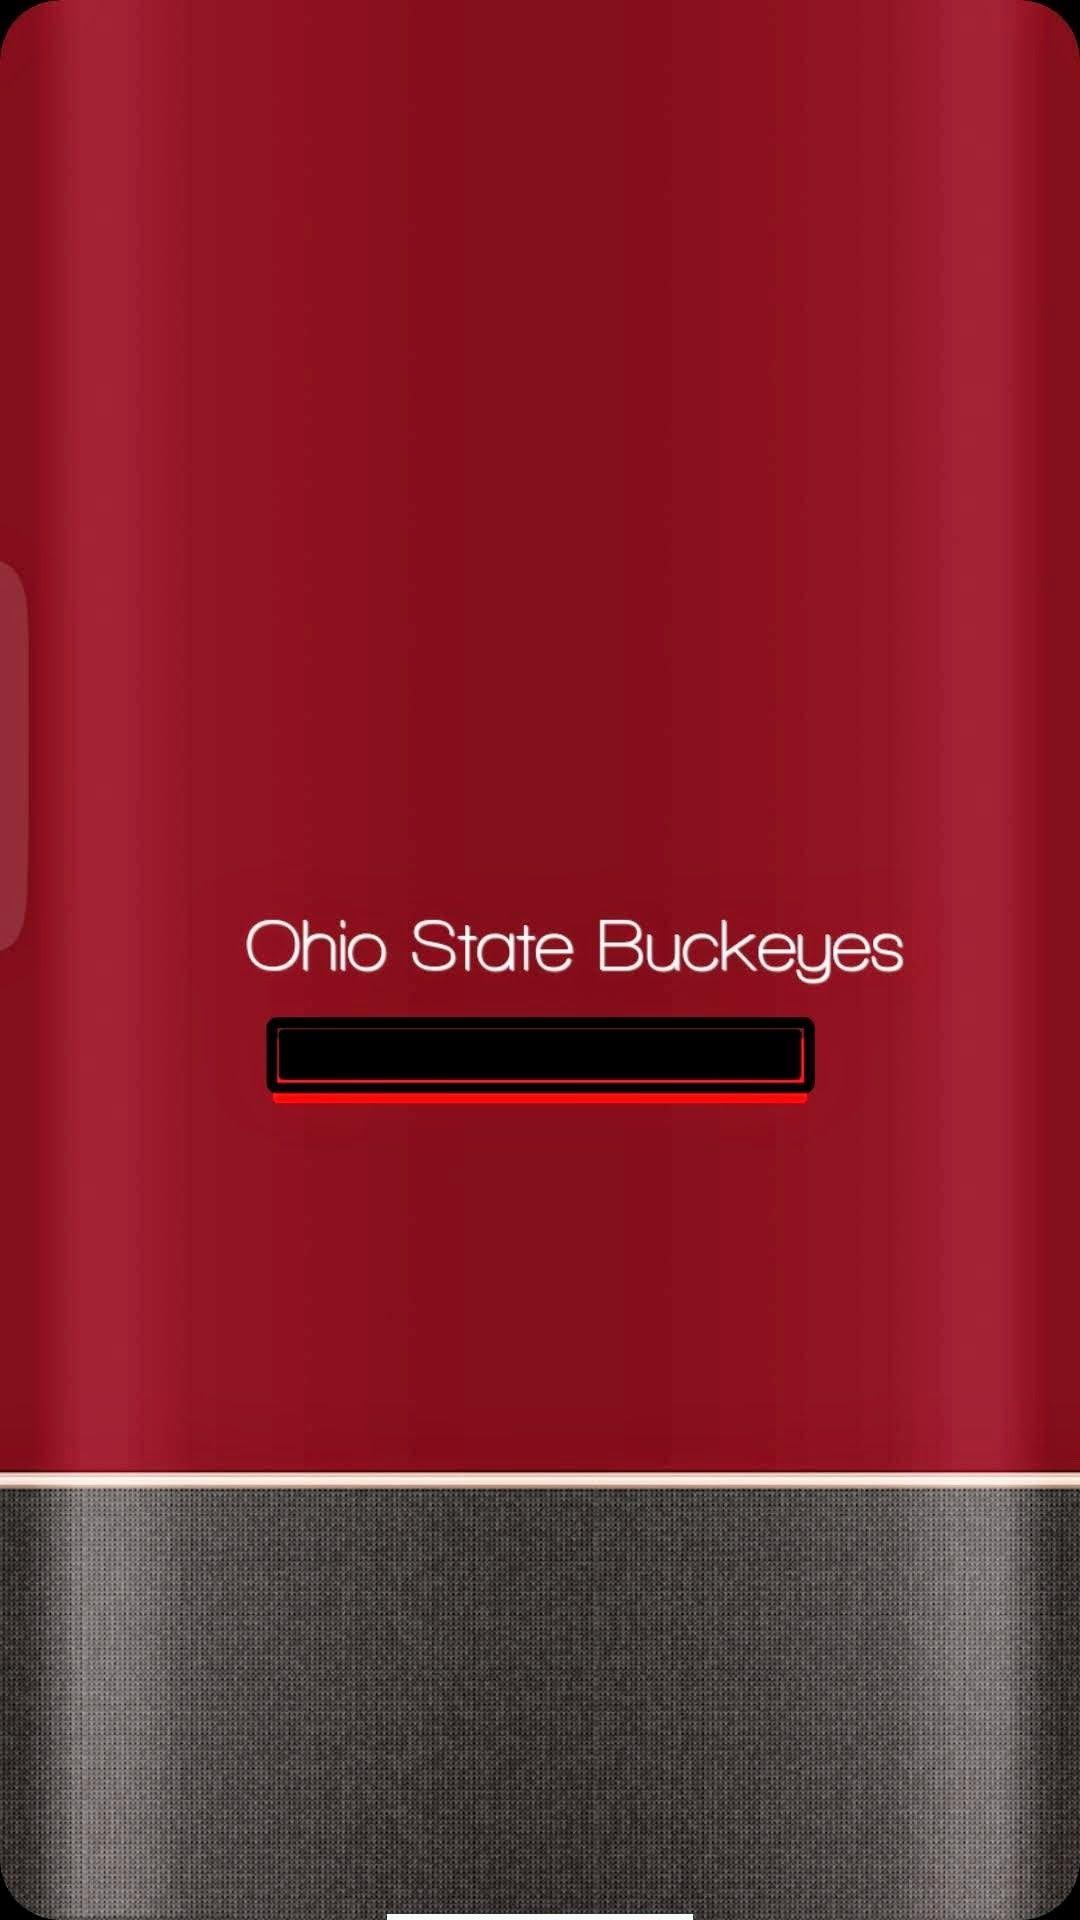 Pin by Daryl Bird on Ohio State Wallpaper Ohio state